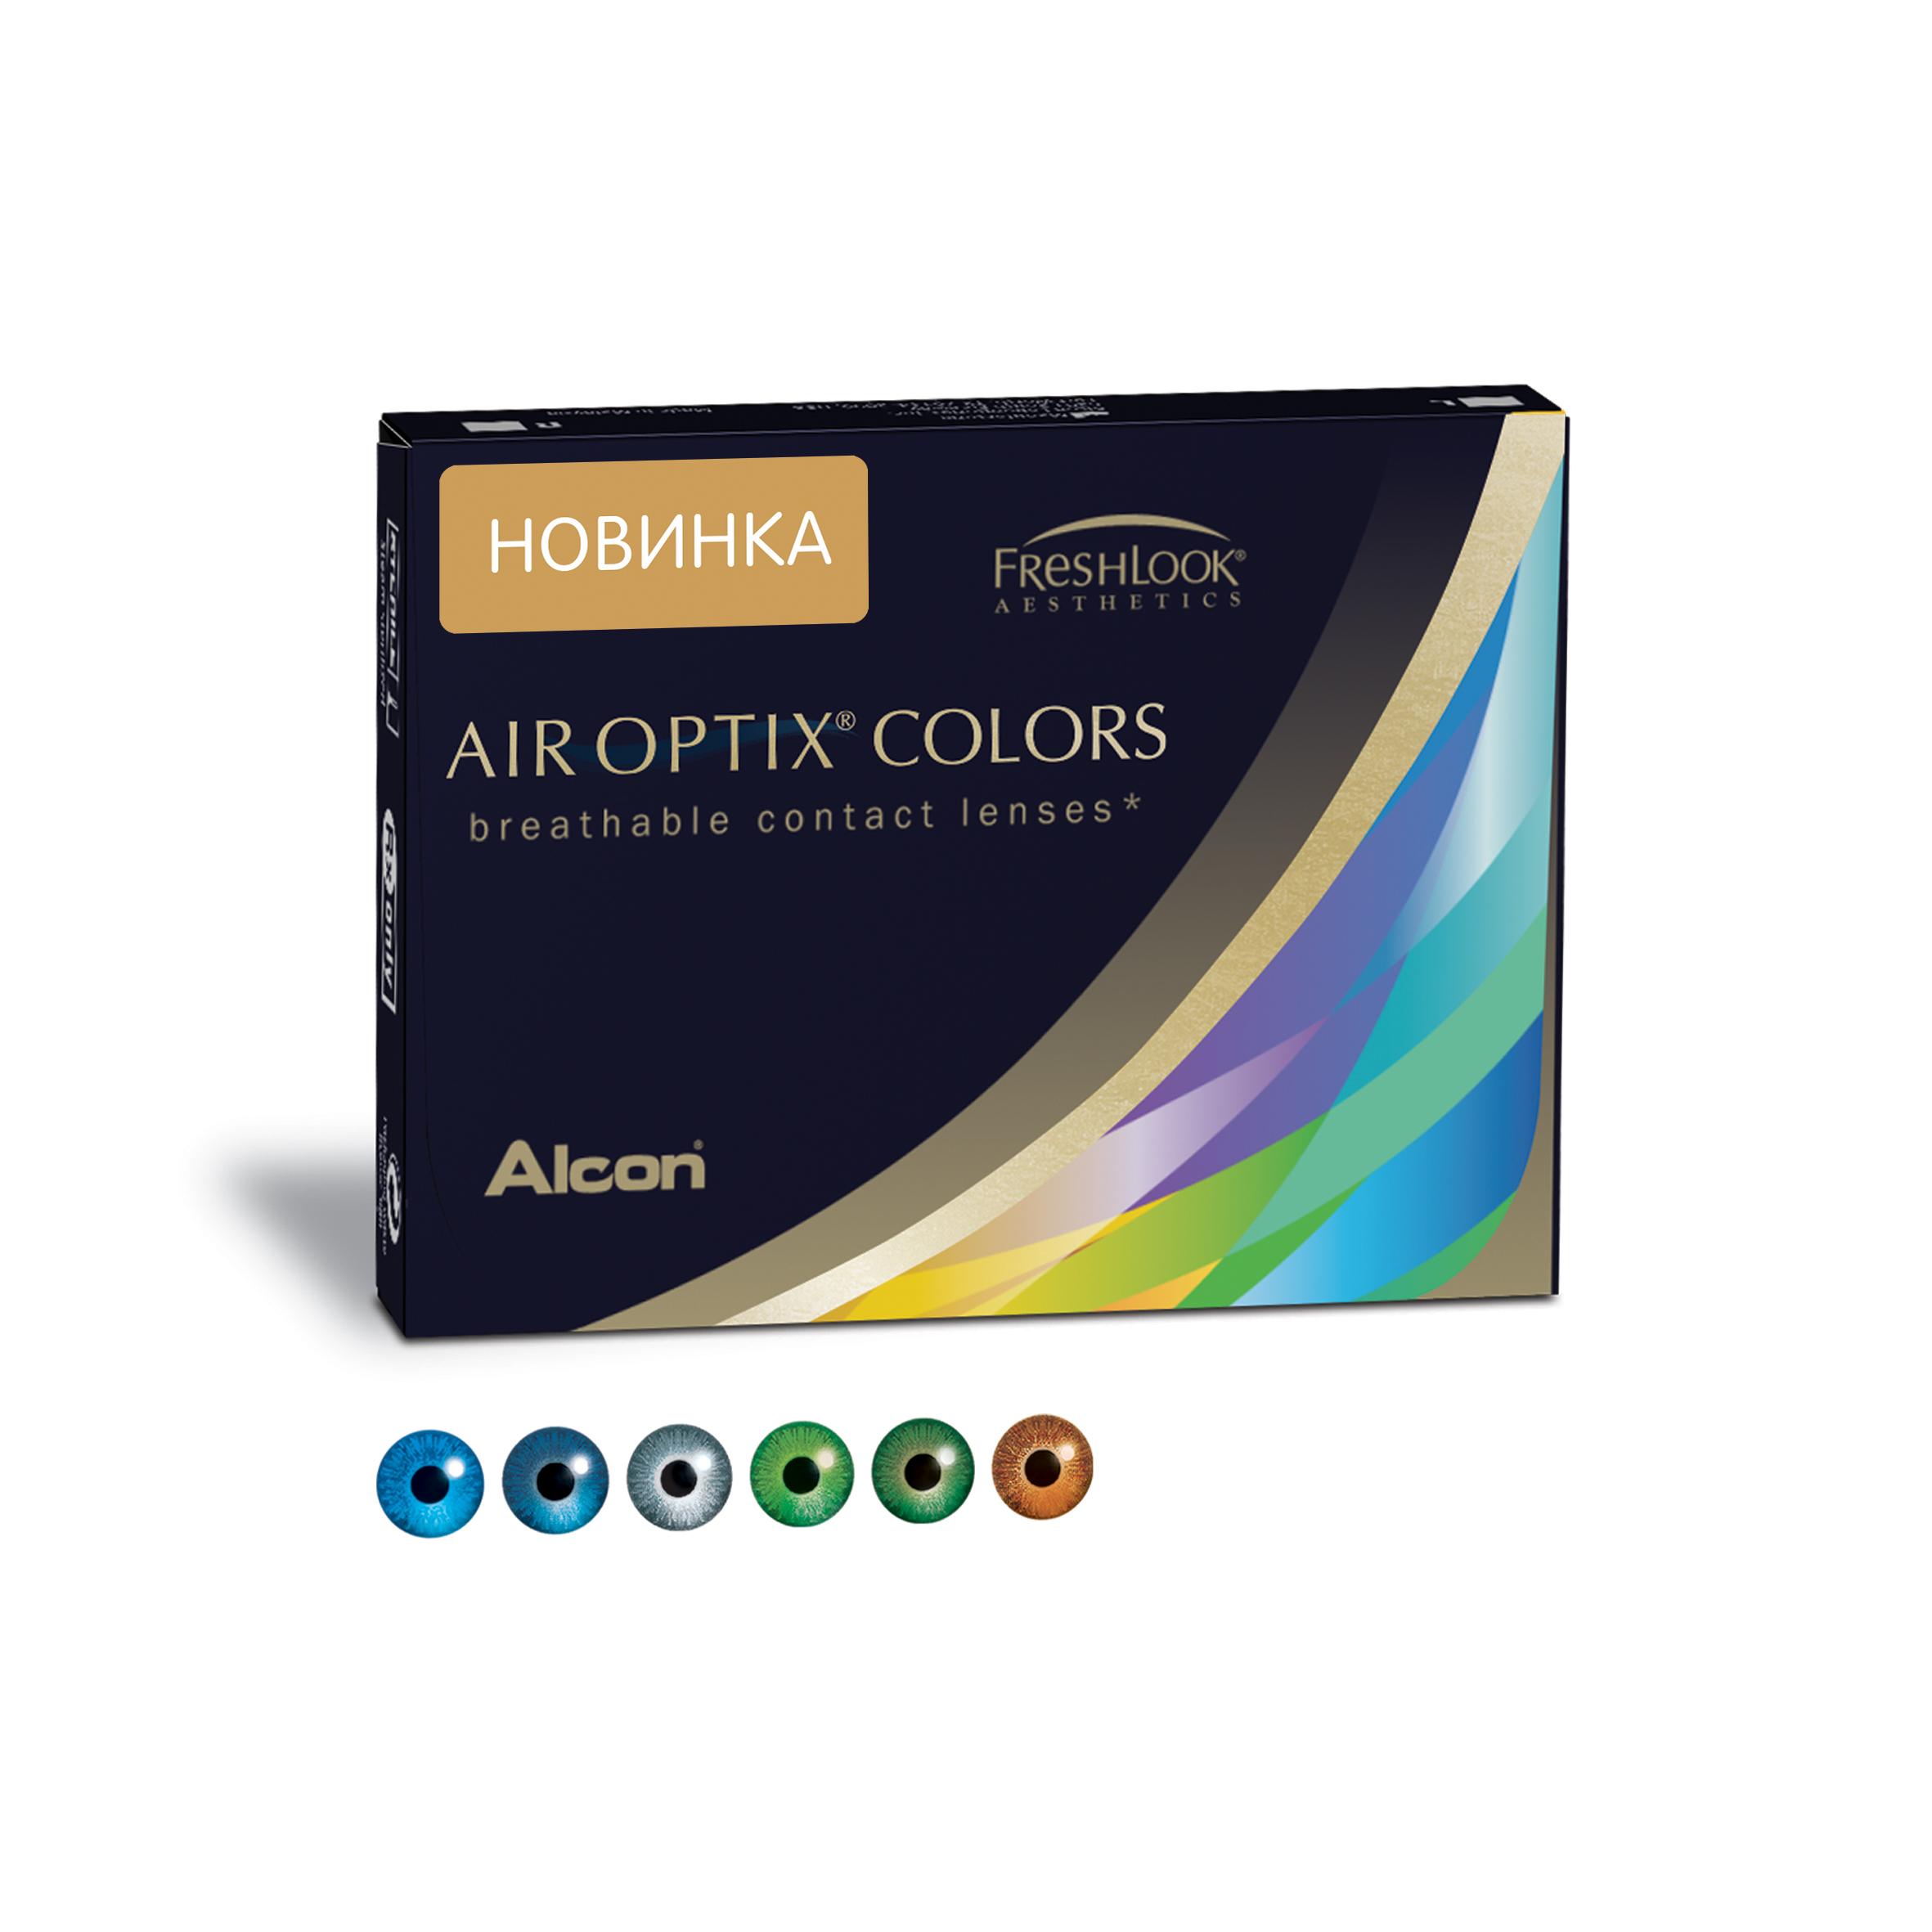 Аlcon контактные линзы Air Optix Colors 2 шт -2.50 Gemstone Green31746178Мягкие контактные линзы